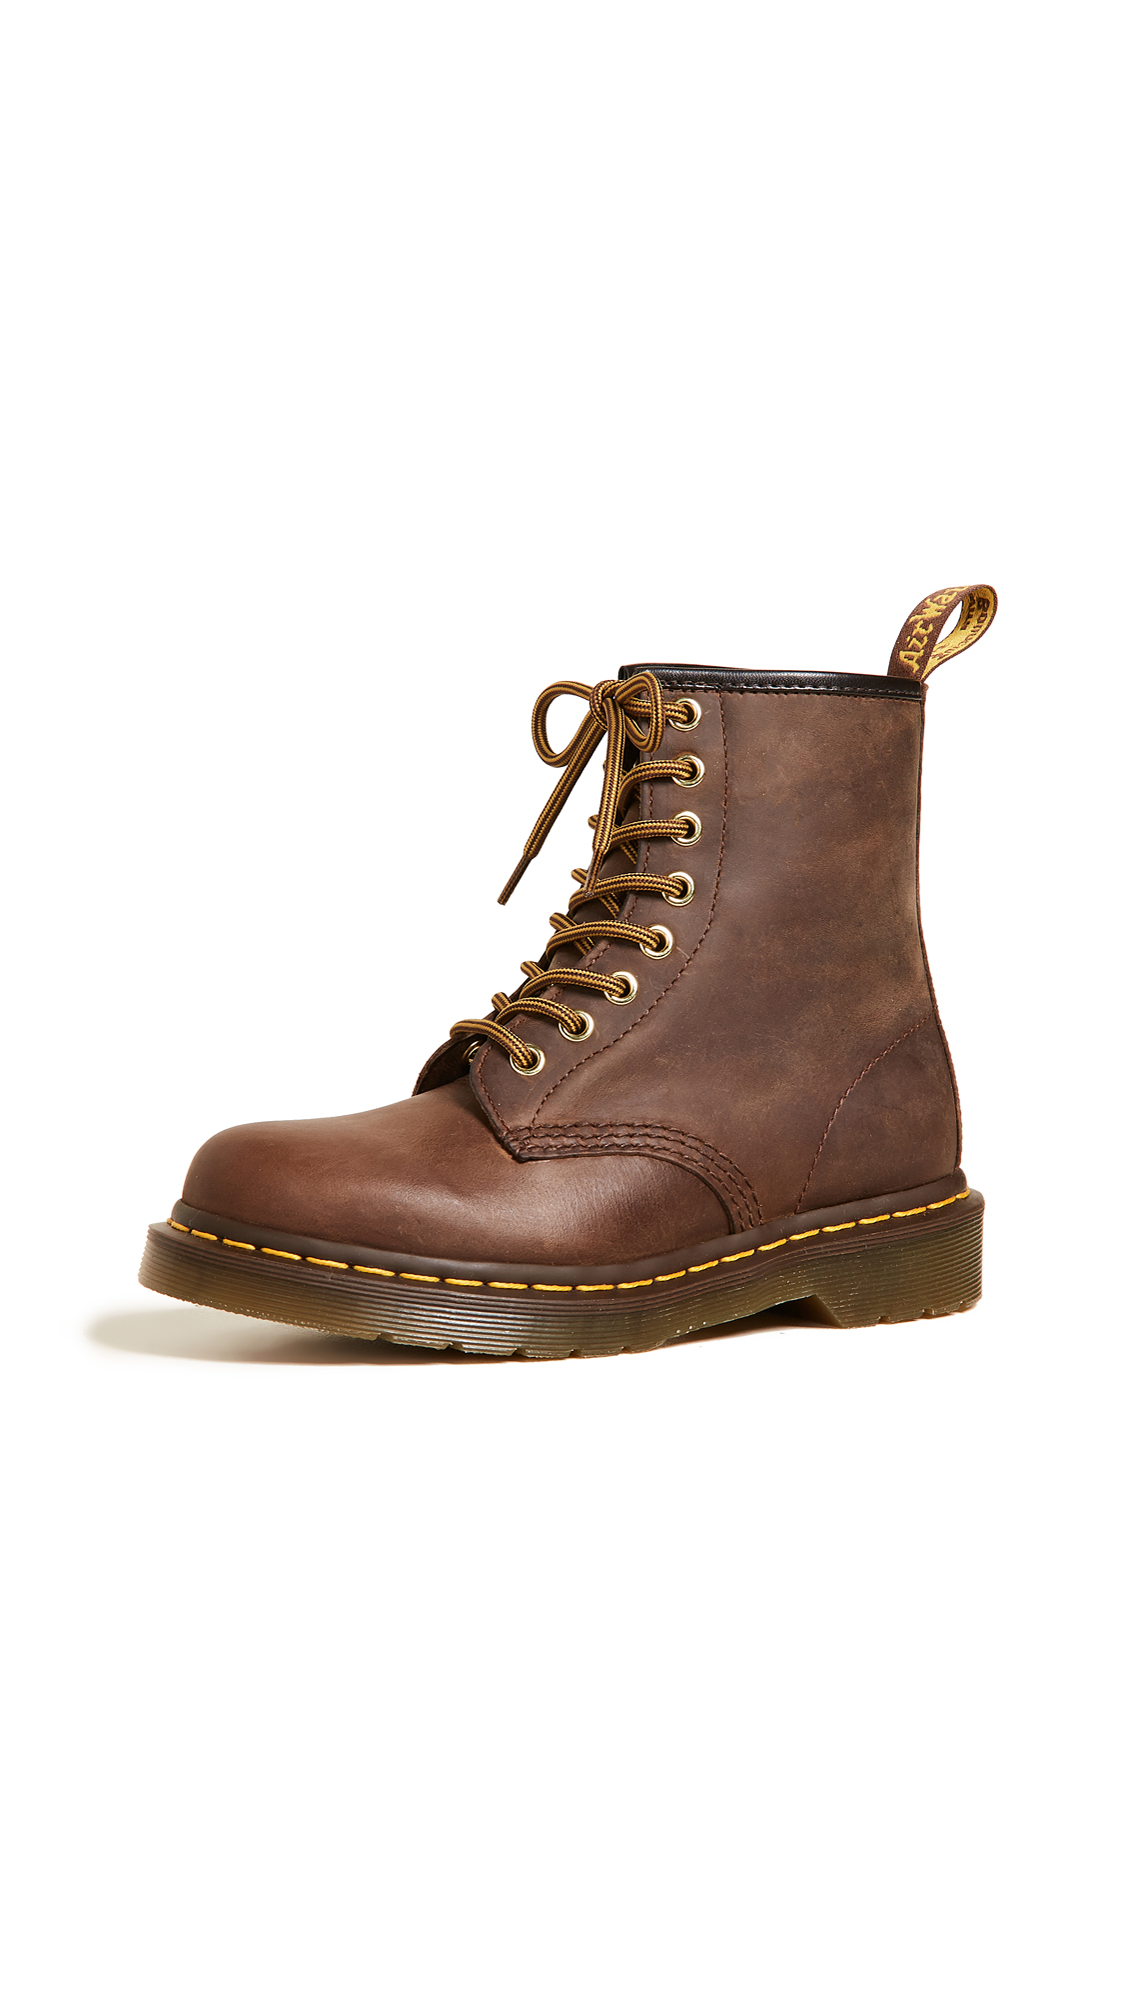 Dr. Martens 1460 8 Eye Boots - Aztec